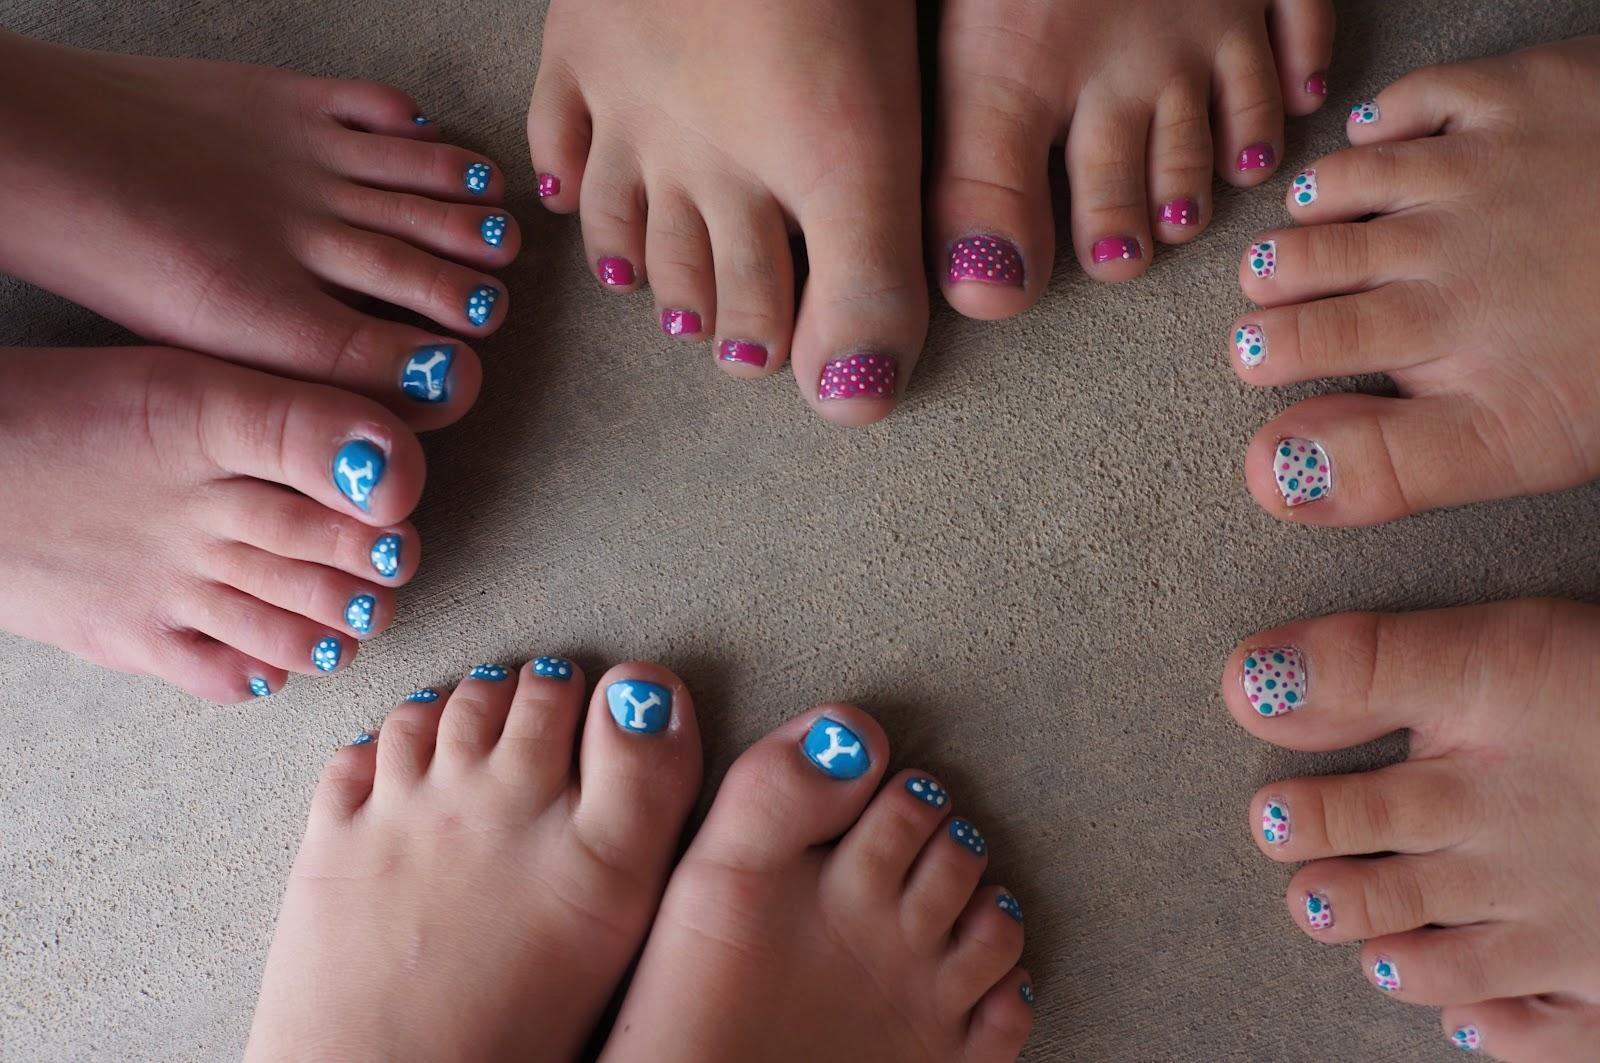 Nail Art: Toenail painting party! :)